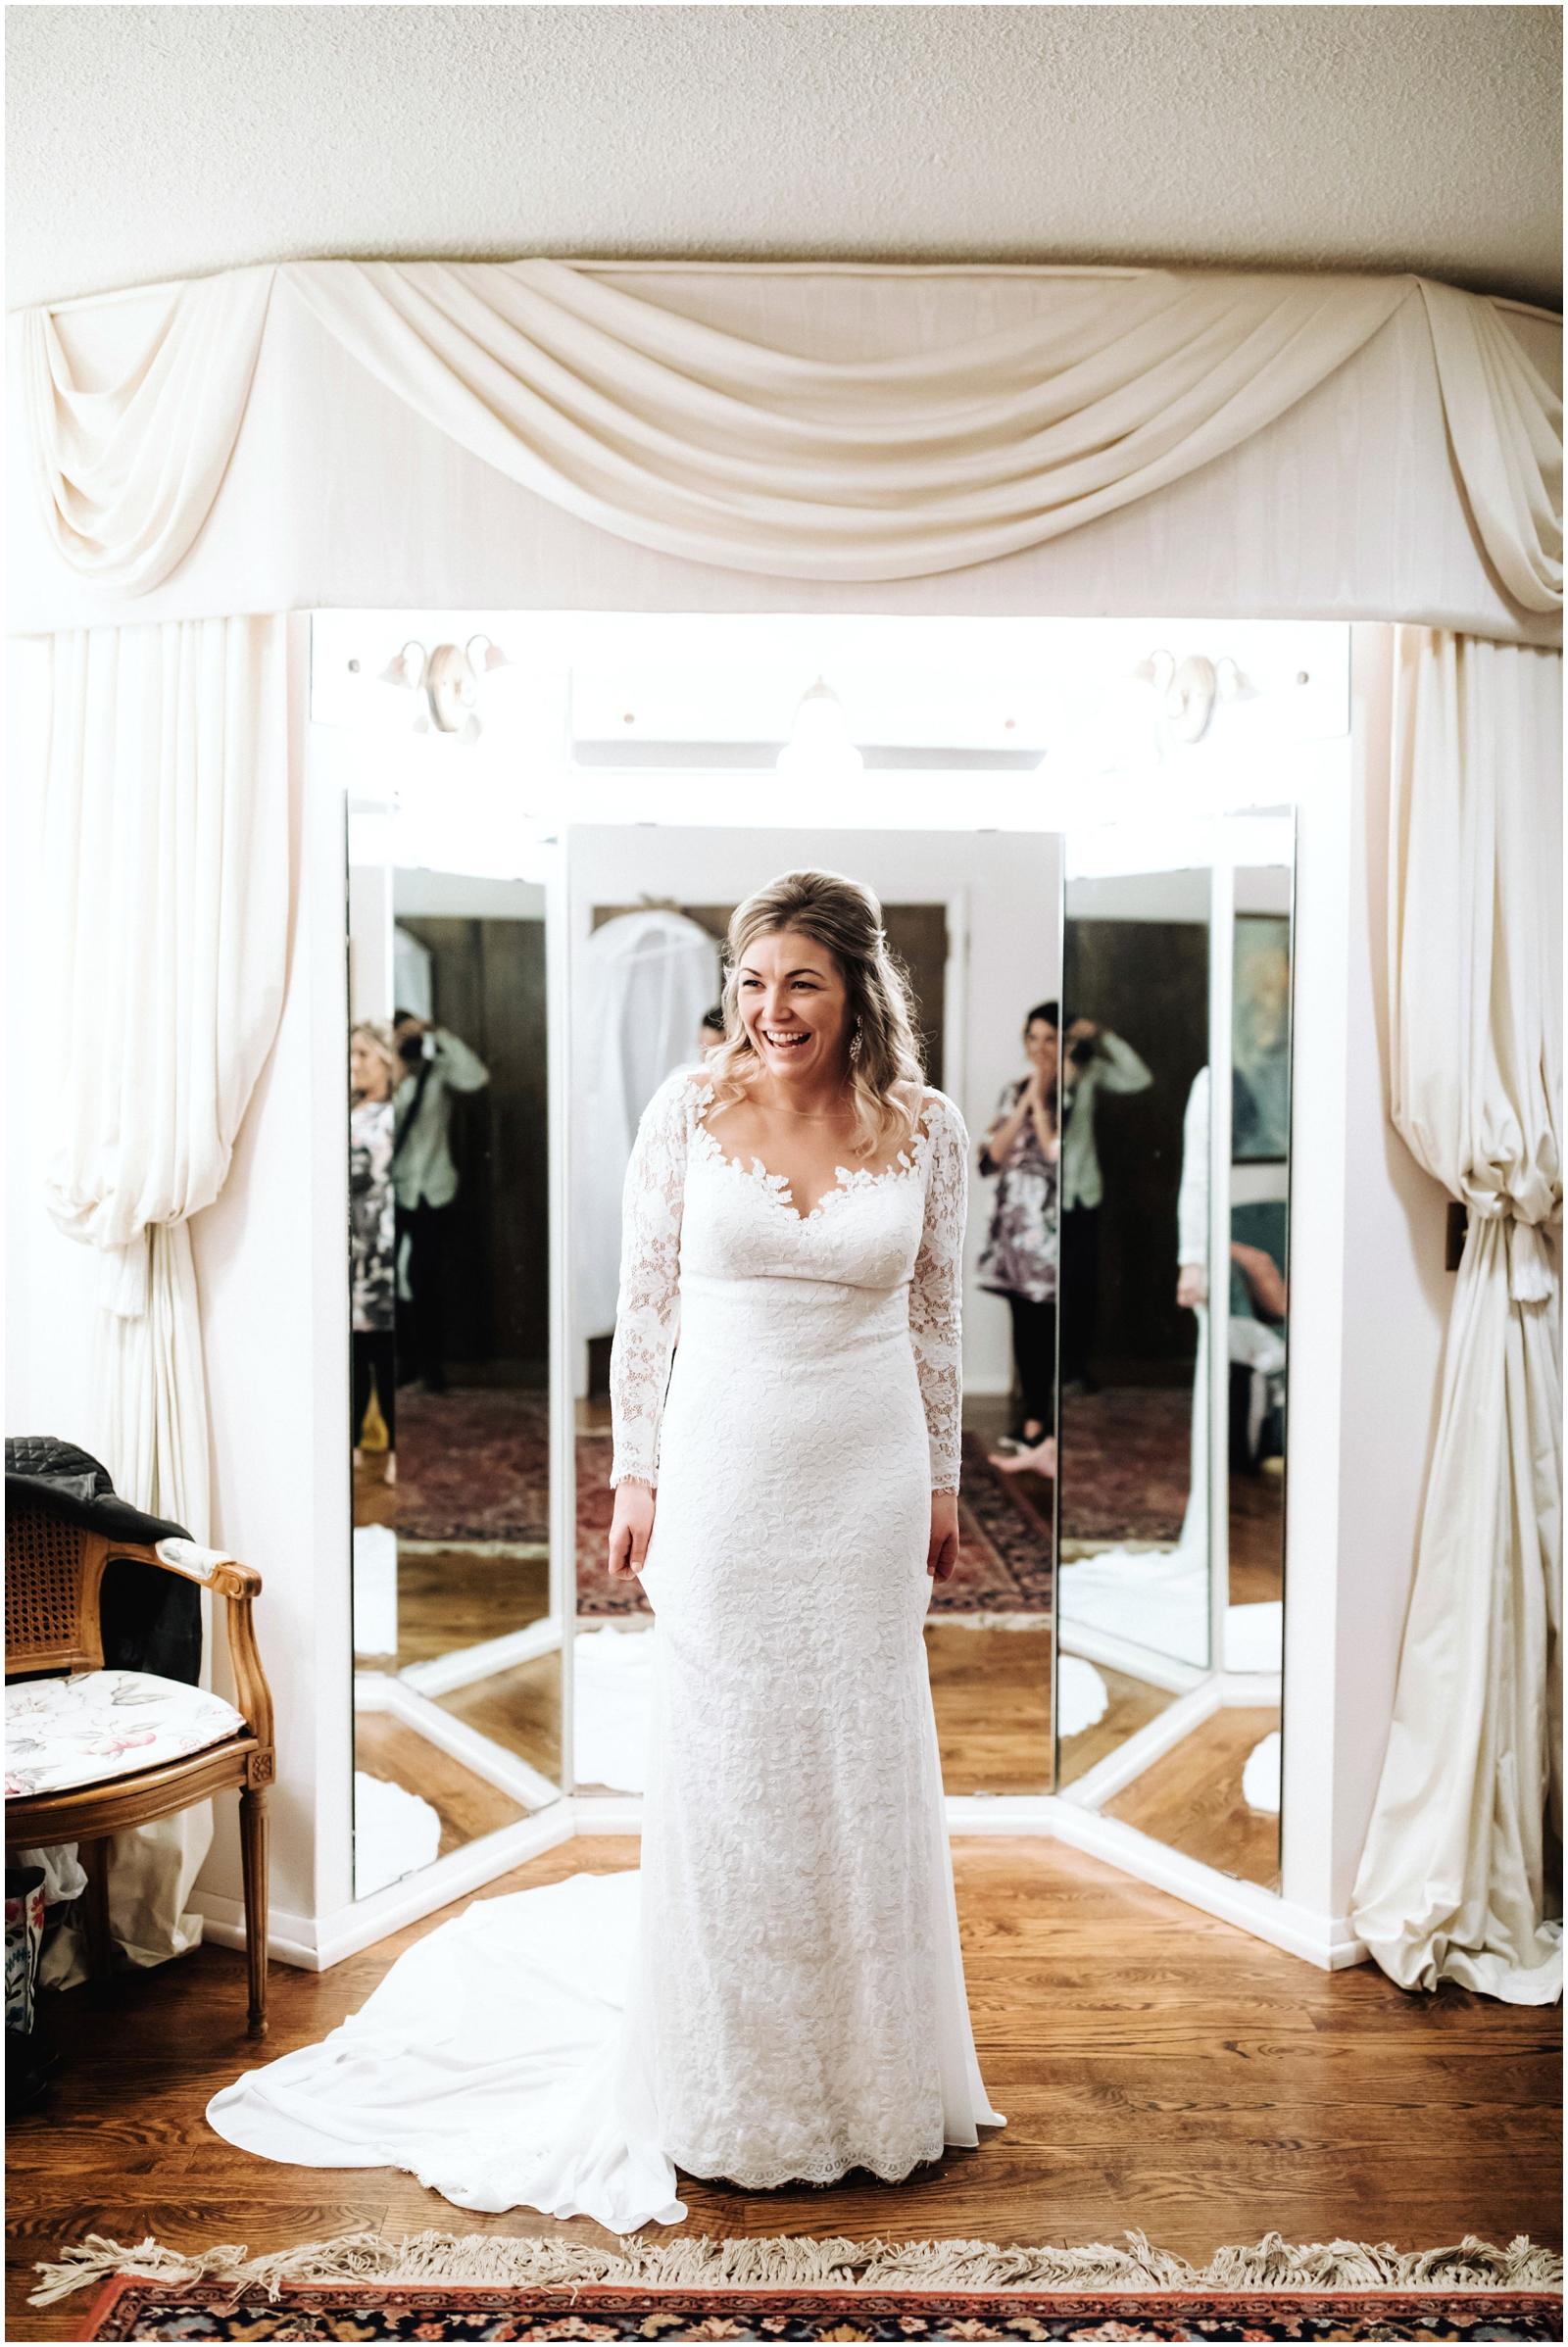 Bride getting ready for her wedding Minnesota Wedding Planner, Mpls Wedding Planner, Machine Shop MPLS, Mpls Wedding Venue